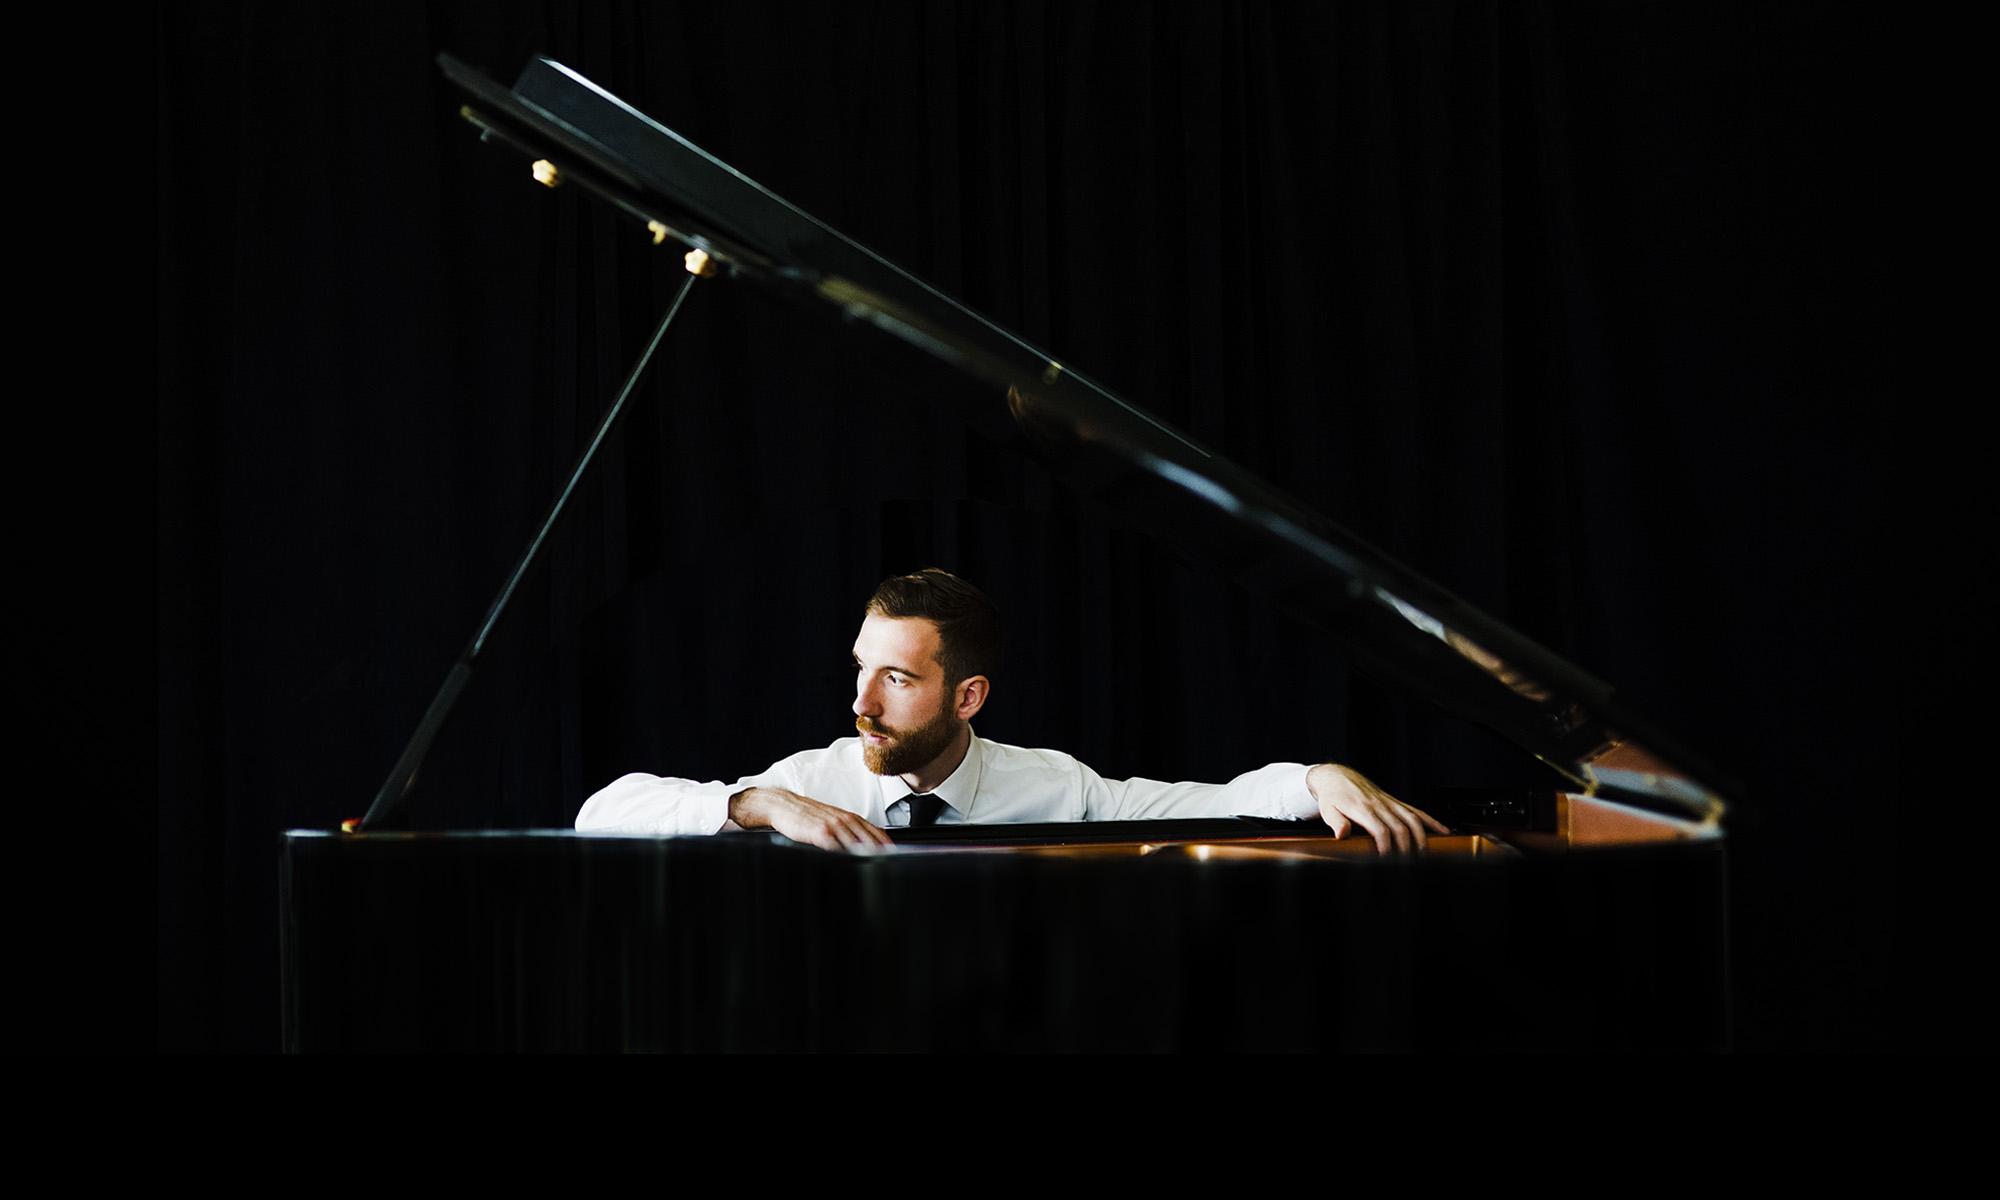 David Potvin | pianist